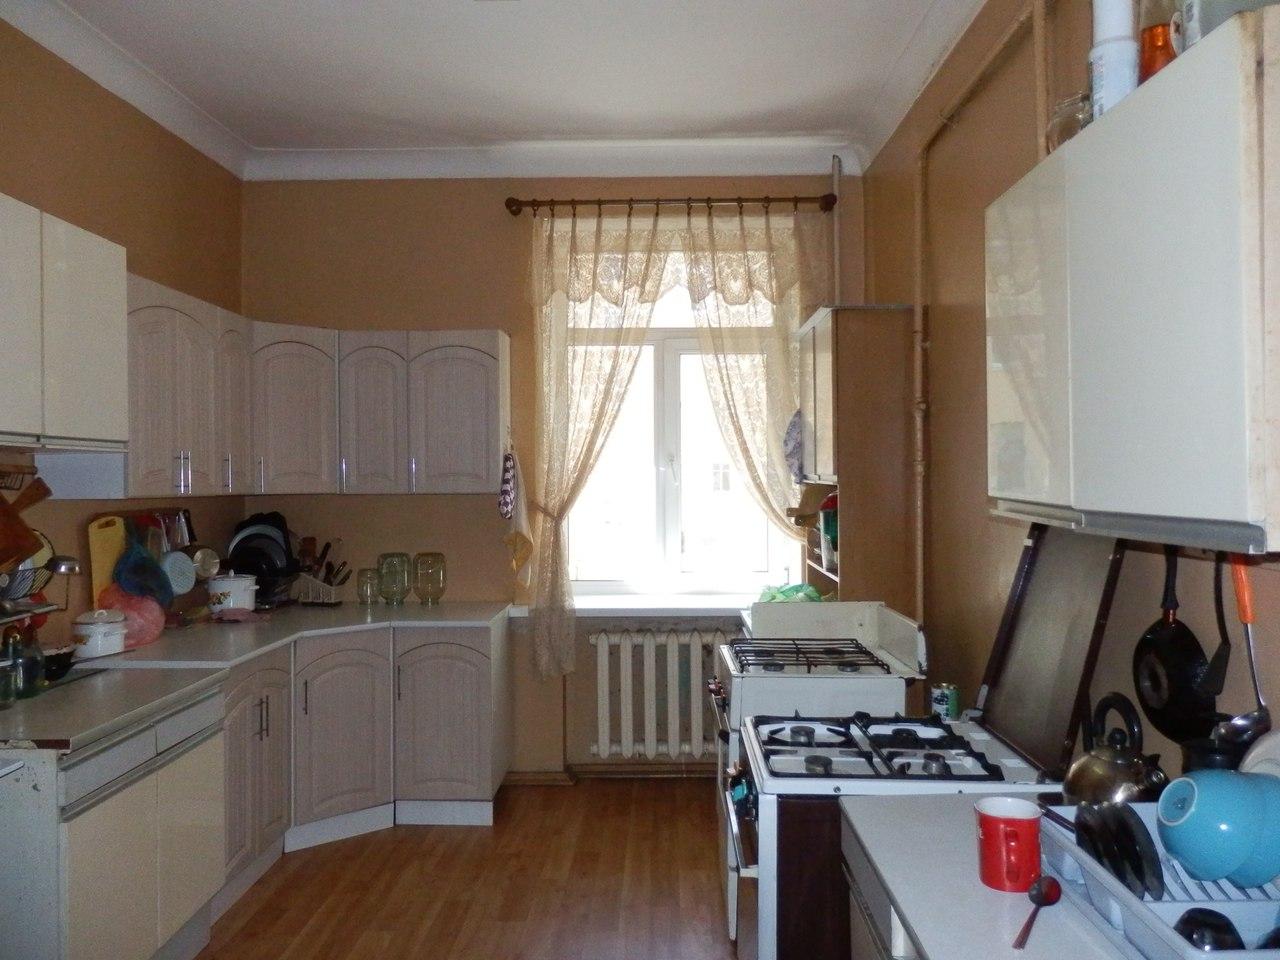 Продается 1 комната в квартире, Красногвардейский район, набережная, Петербург FeeEo8stXqU